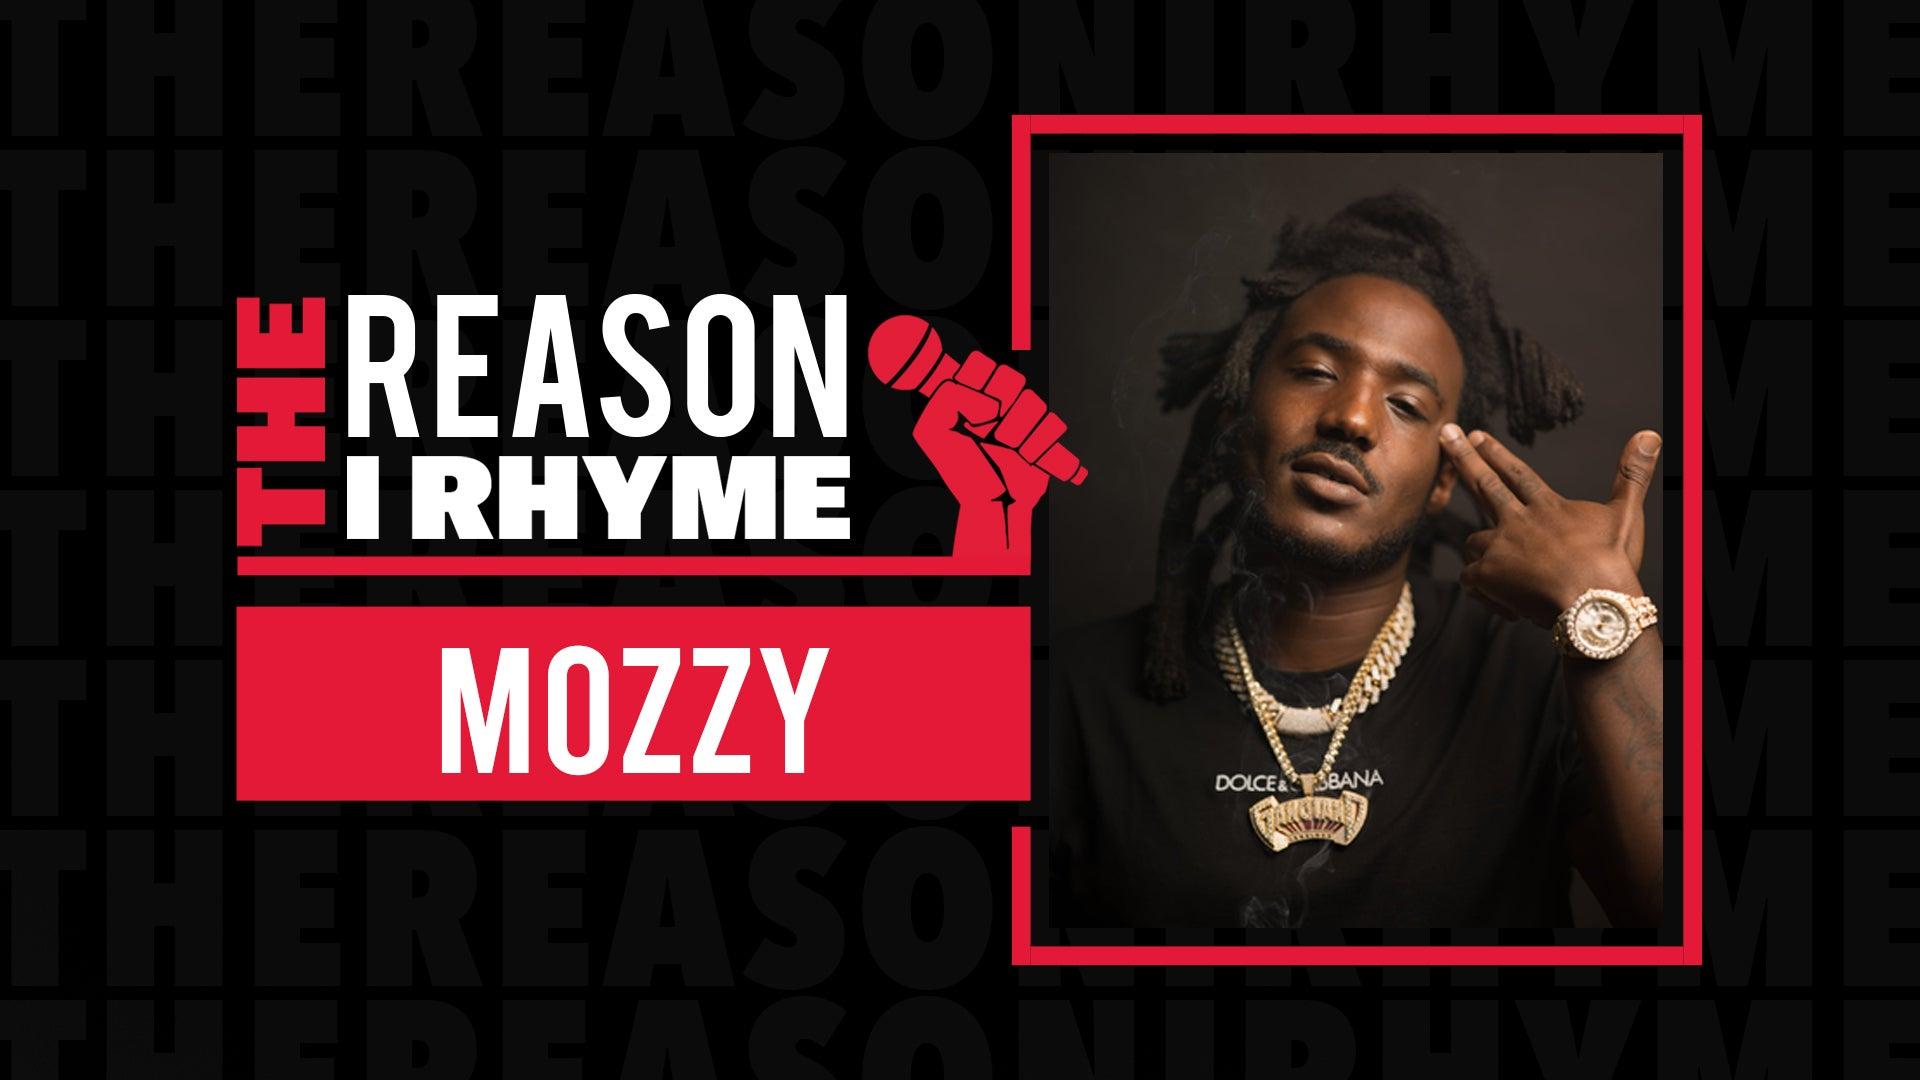 The Reason I Rhyme: Mozzy